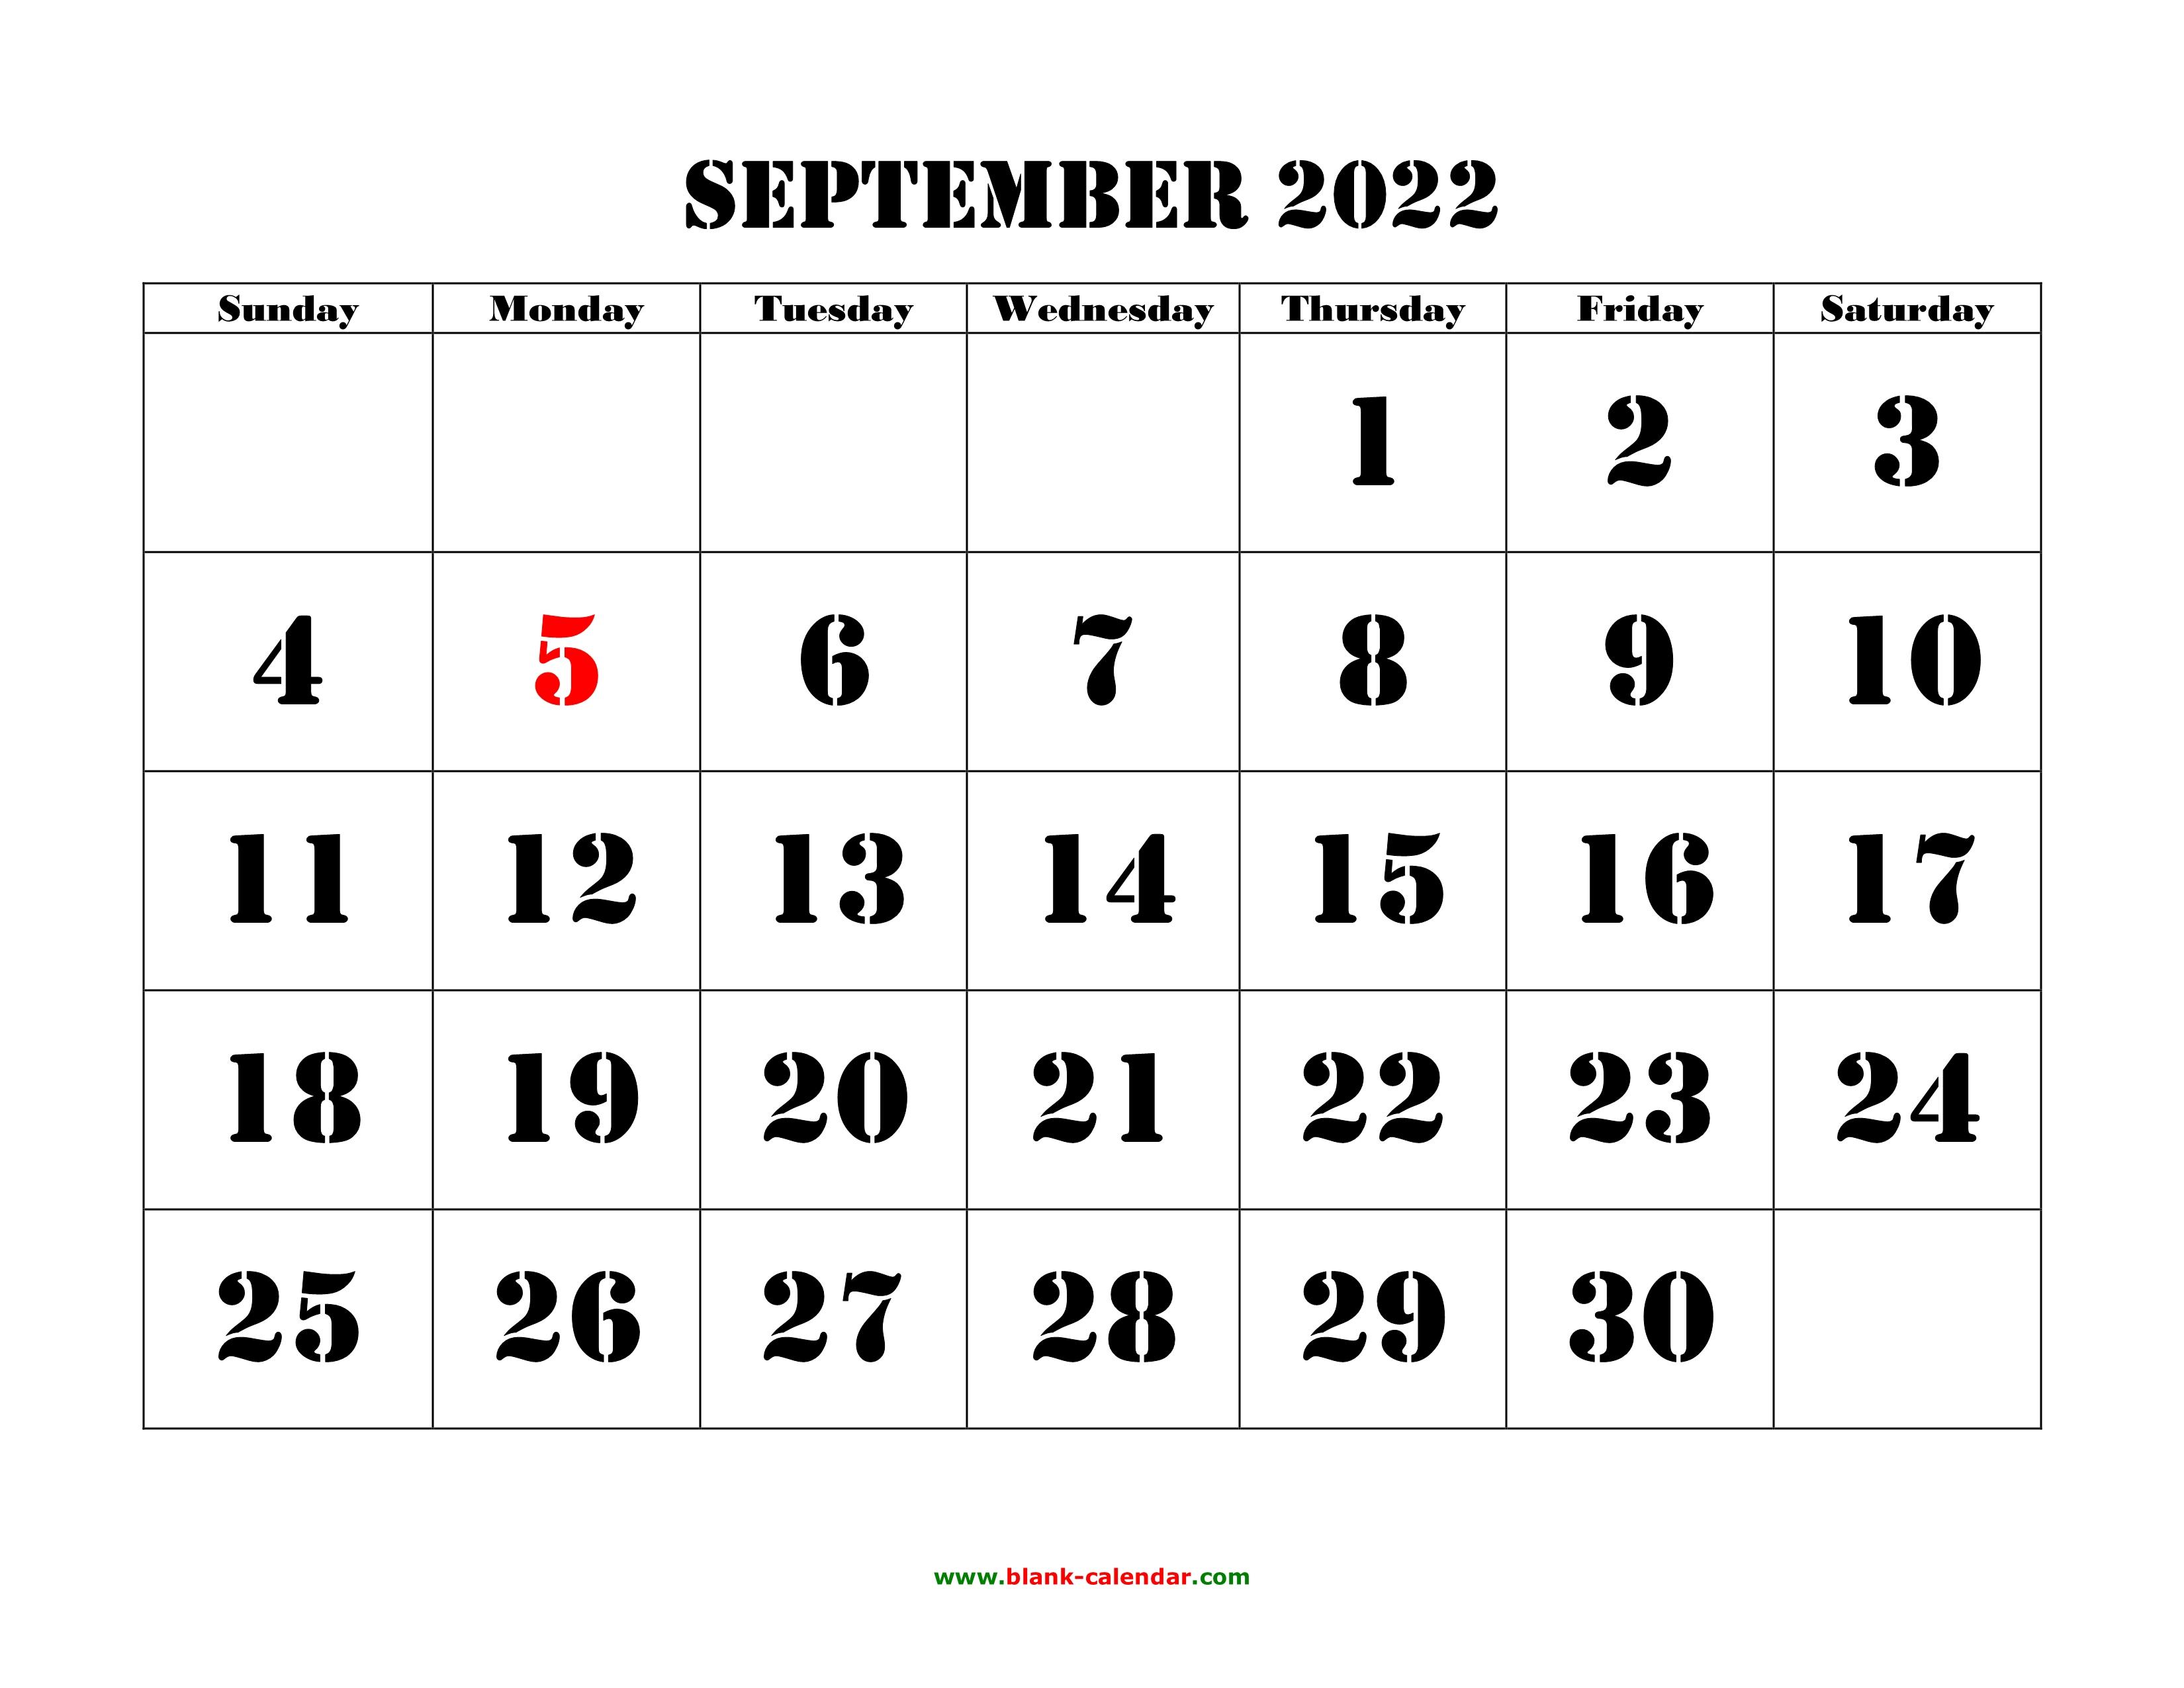 Printable September Calendar 2022.Free Download Printable September 2022 Calendar Large Font Design Holidays On Red